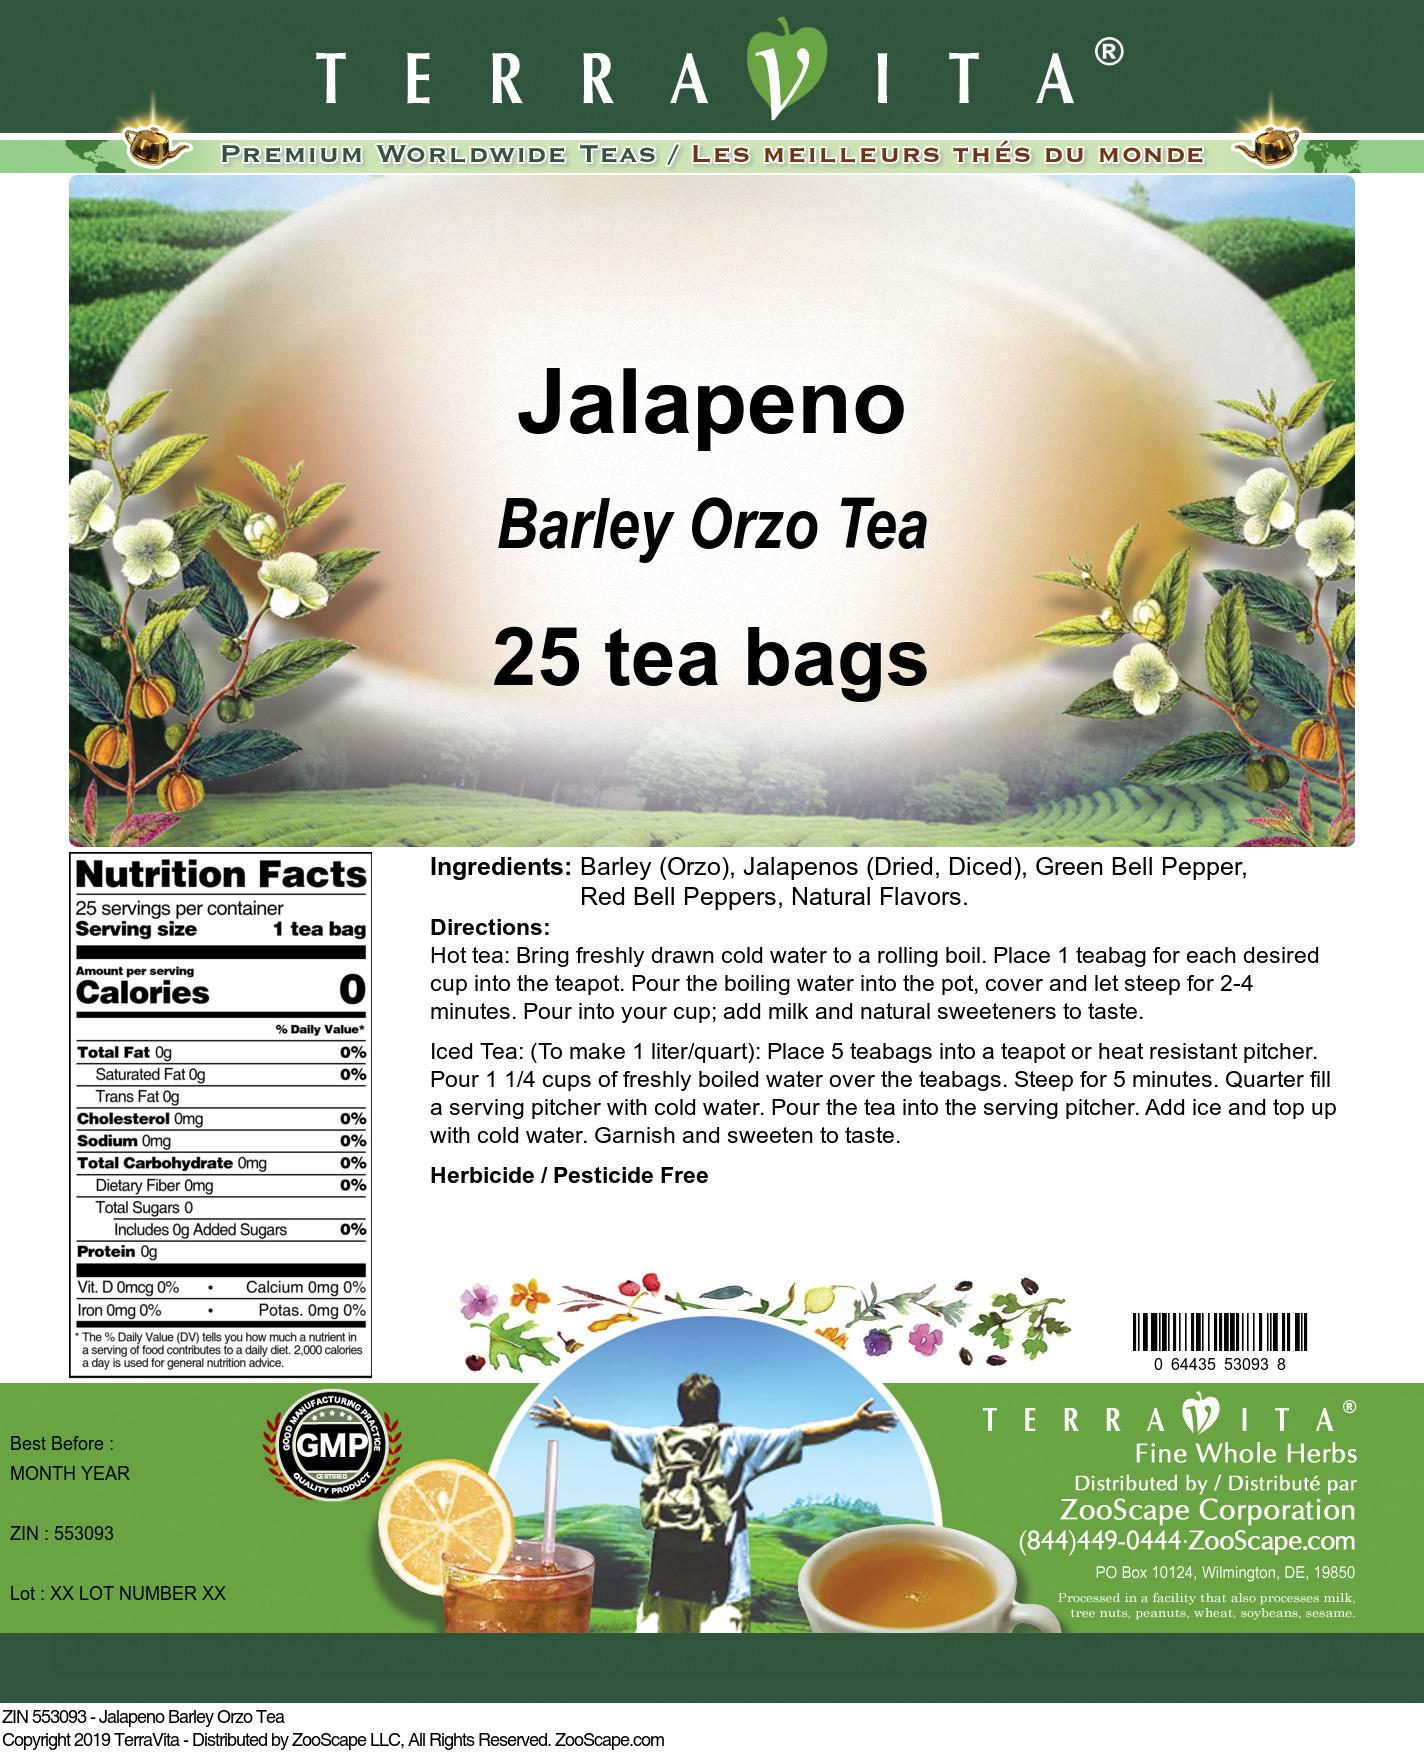 Jalapeno Barley Orzo Tea